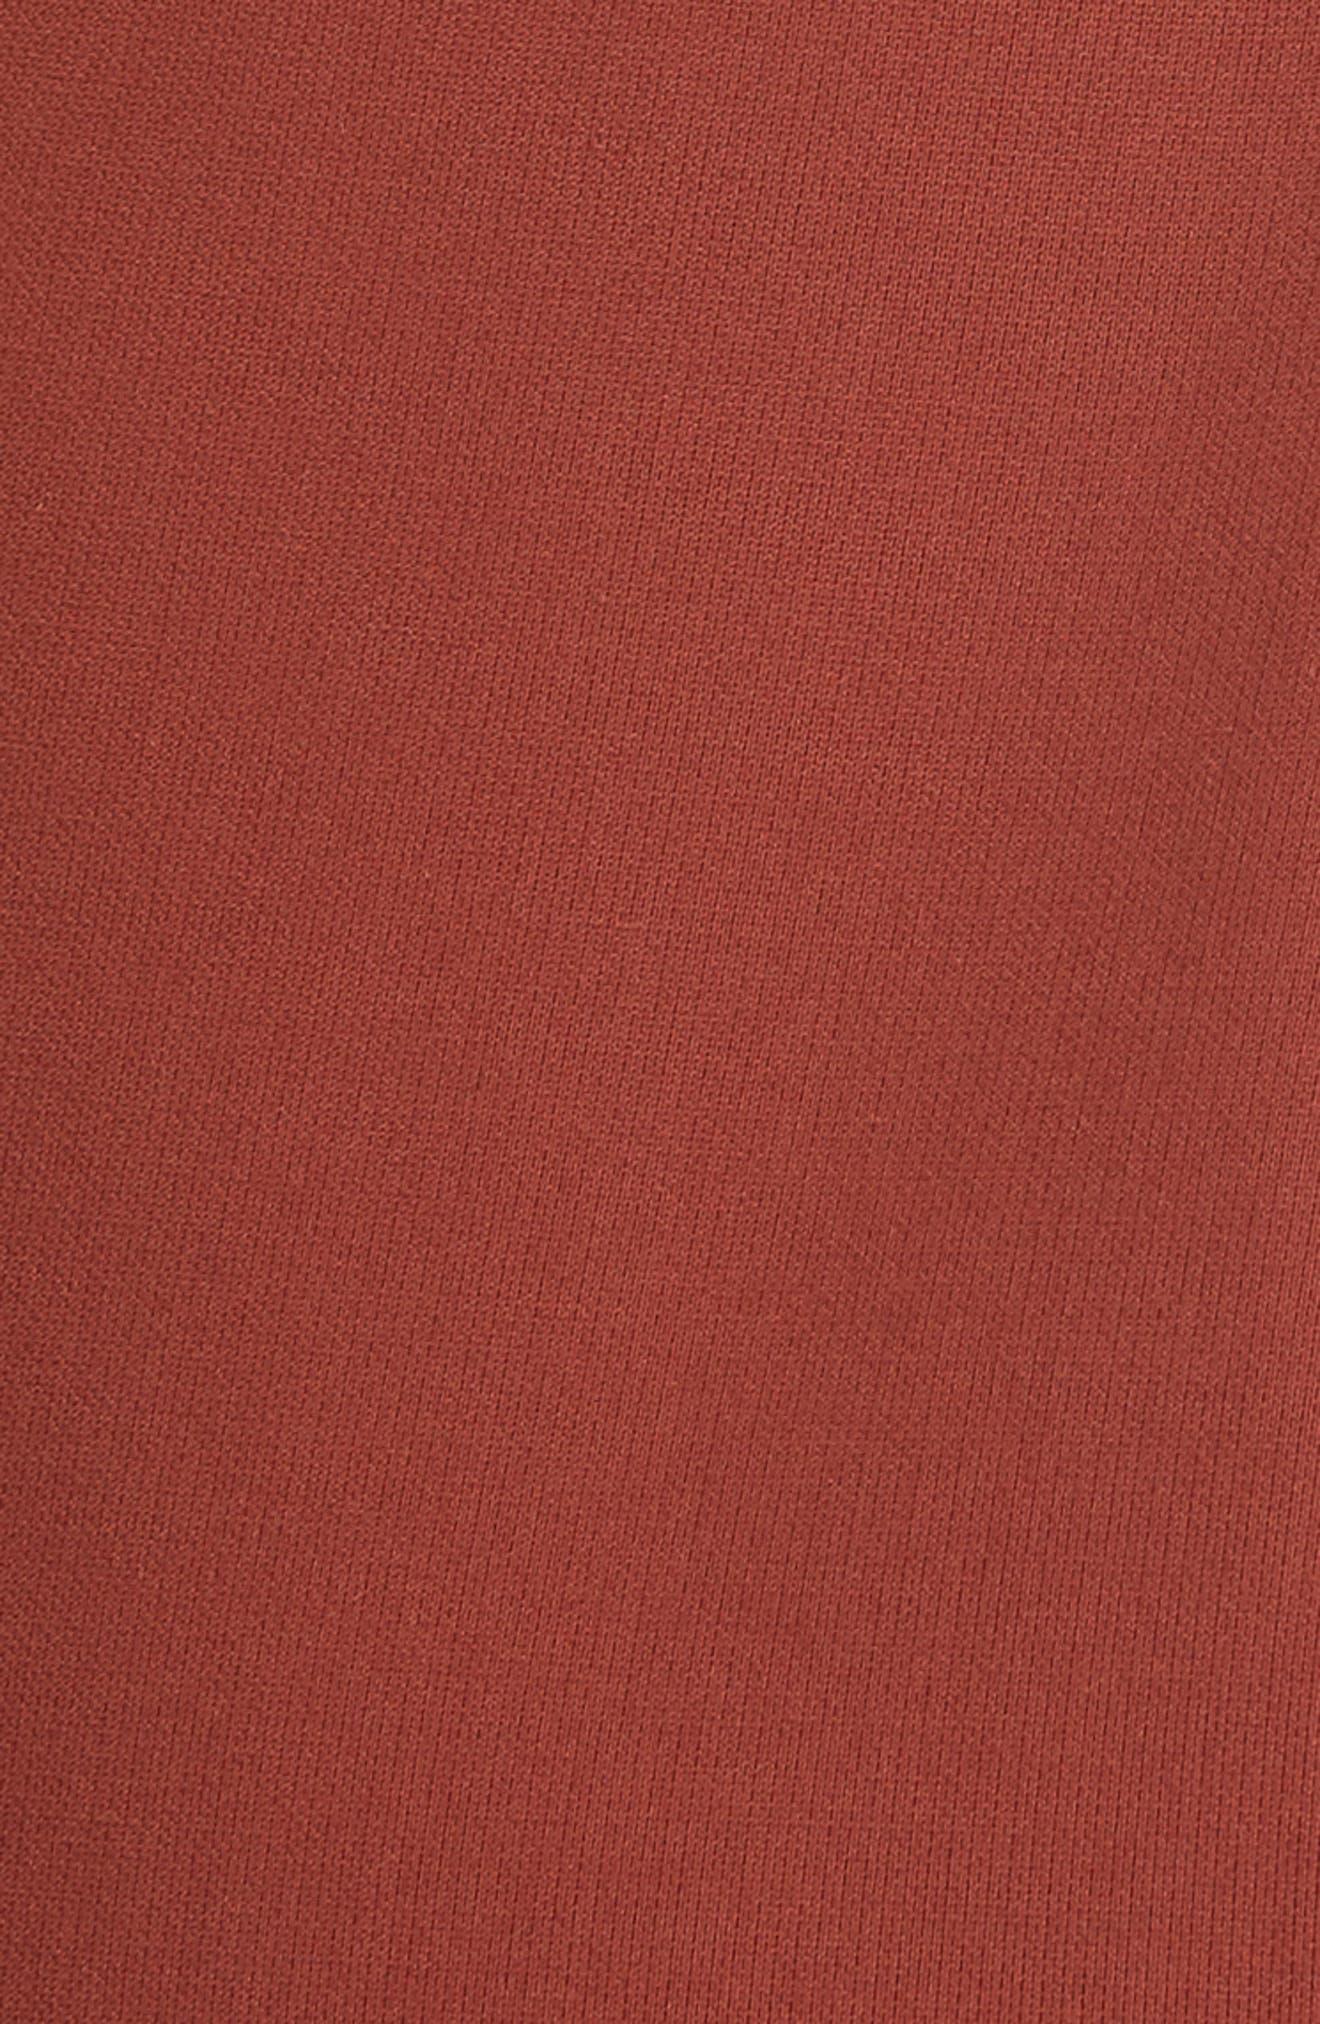 Adelise Crossover Sleeveless Sheath Dress,                             Alternate thumbnail 5, color,                             845